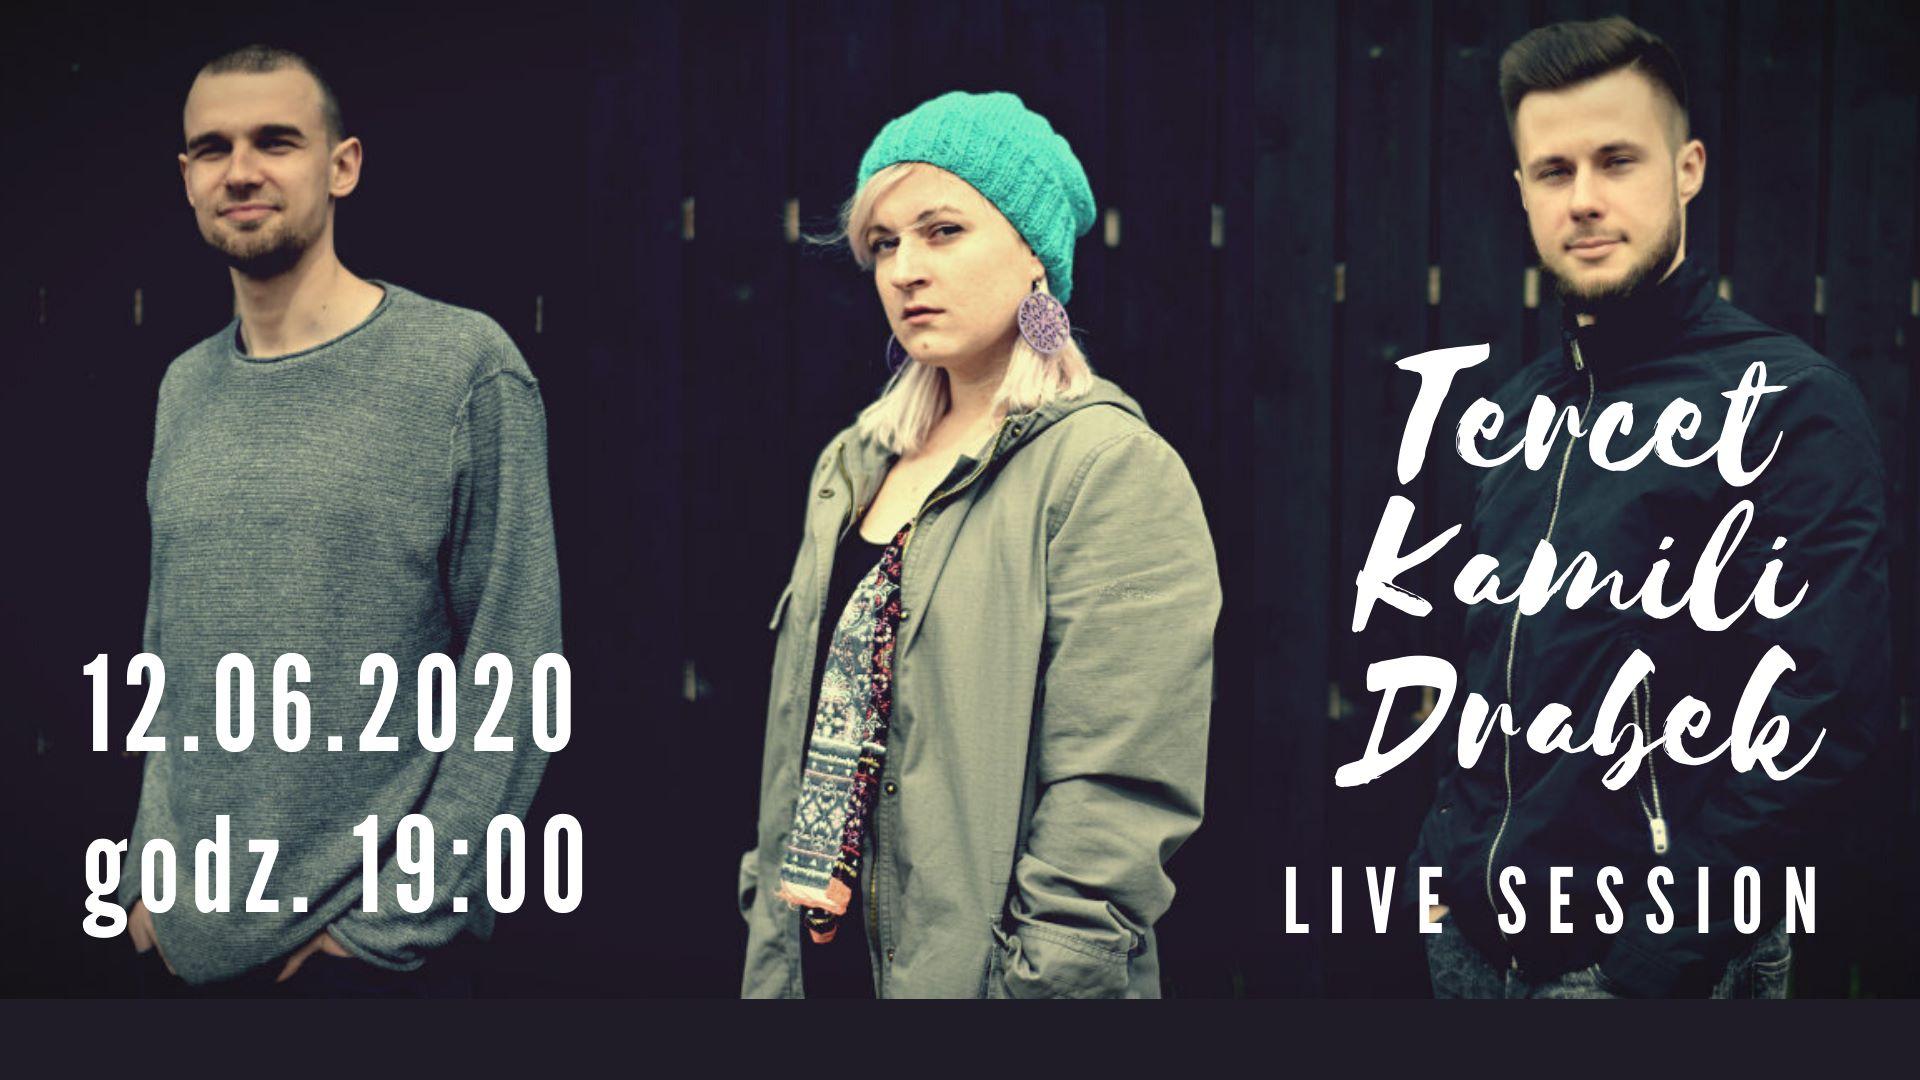 Live stream #10 - Tercet Kamilii Drabek